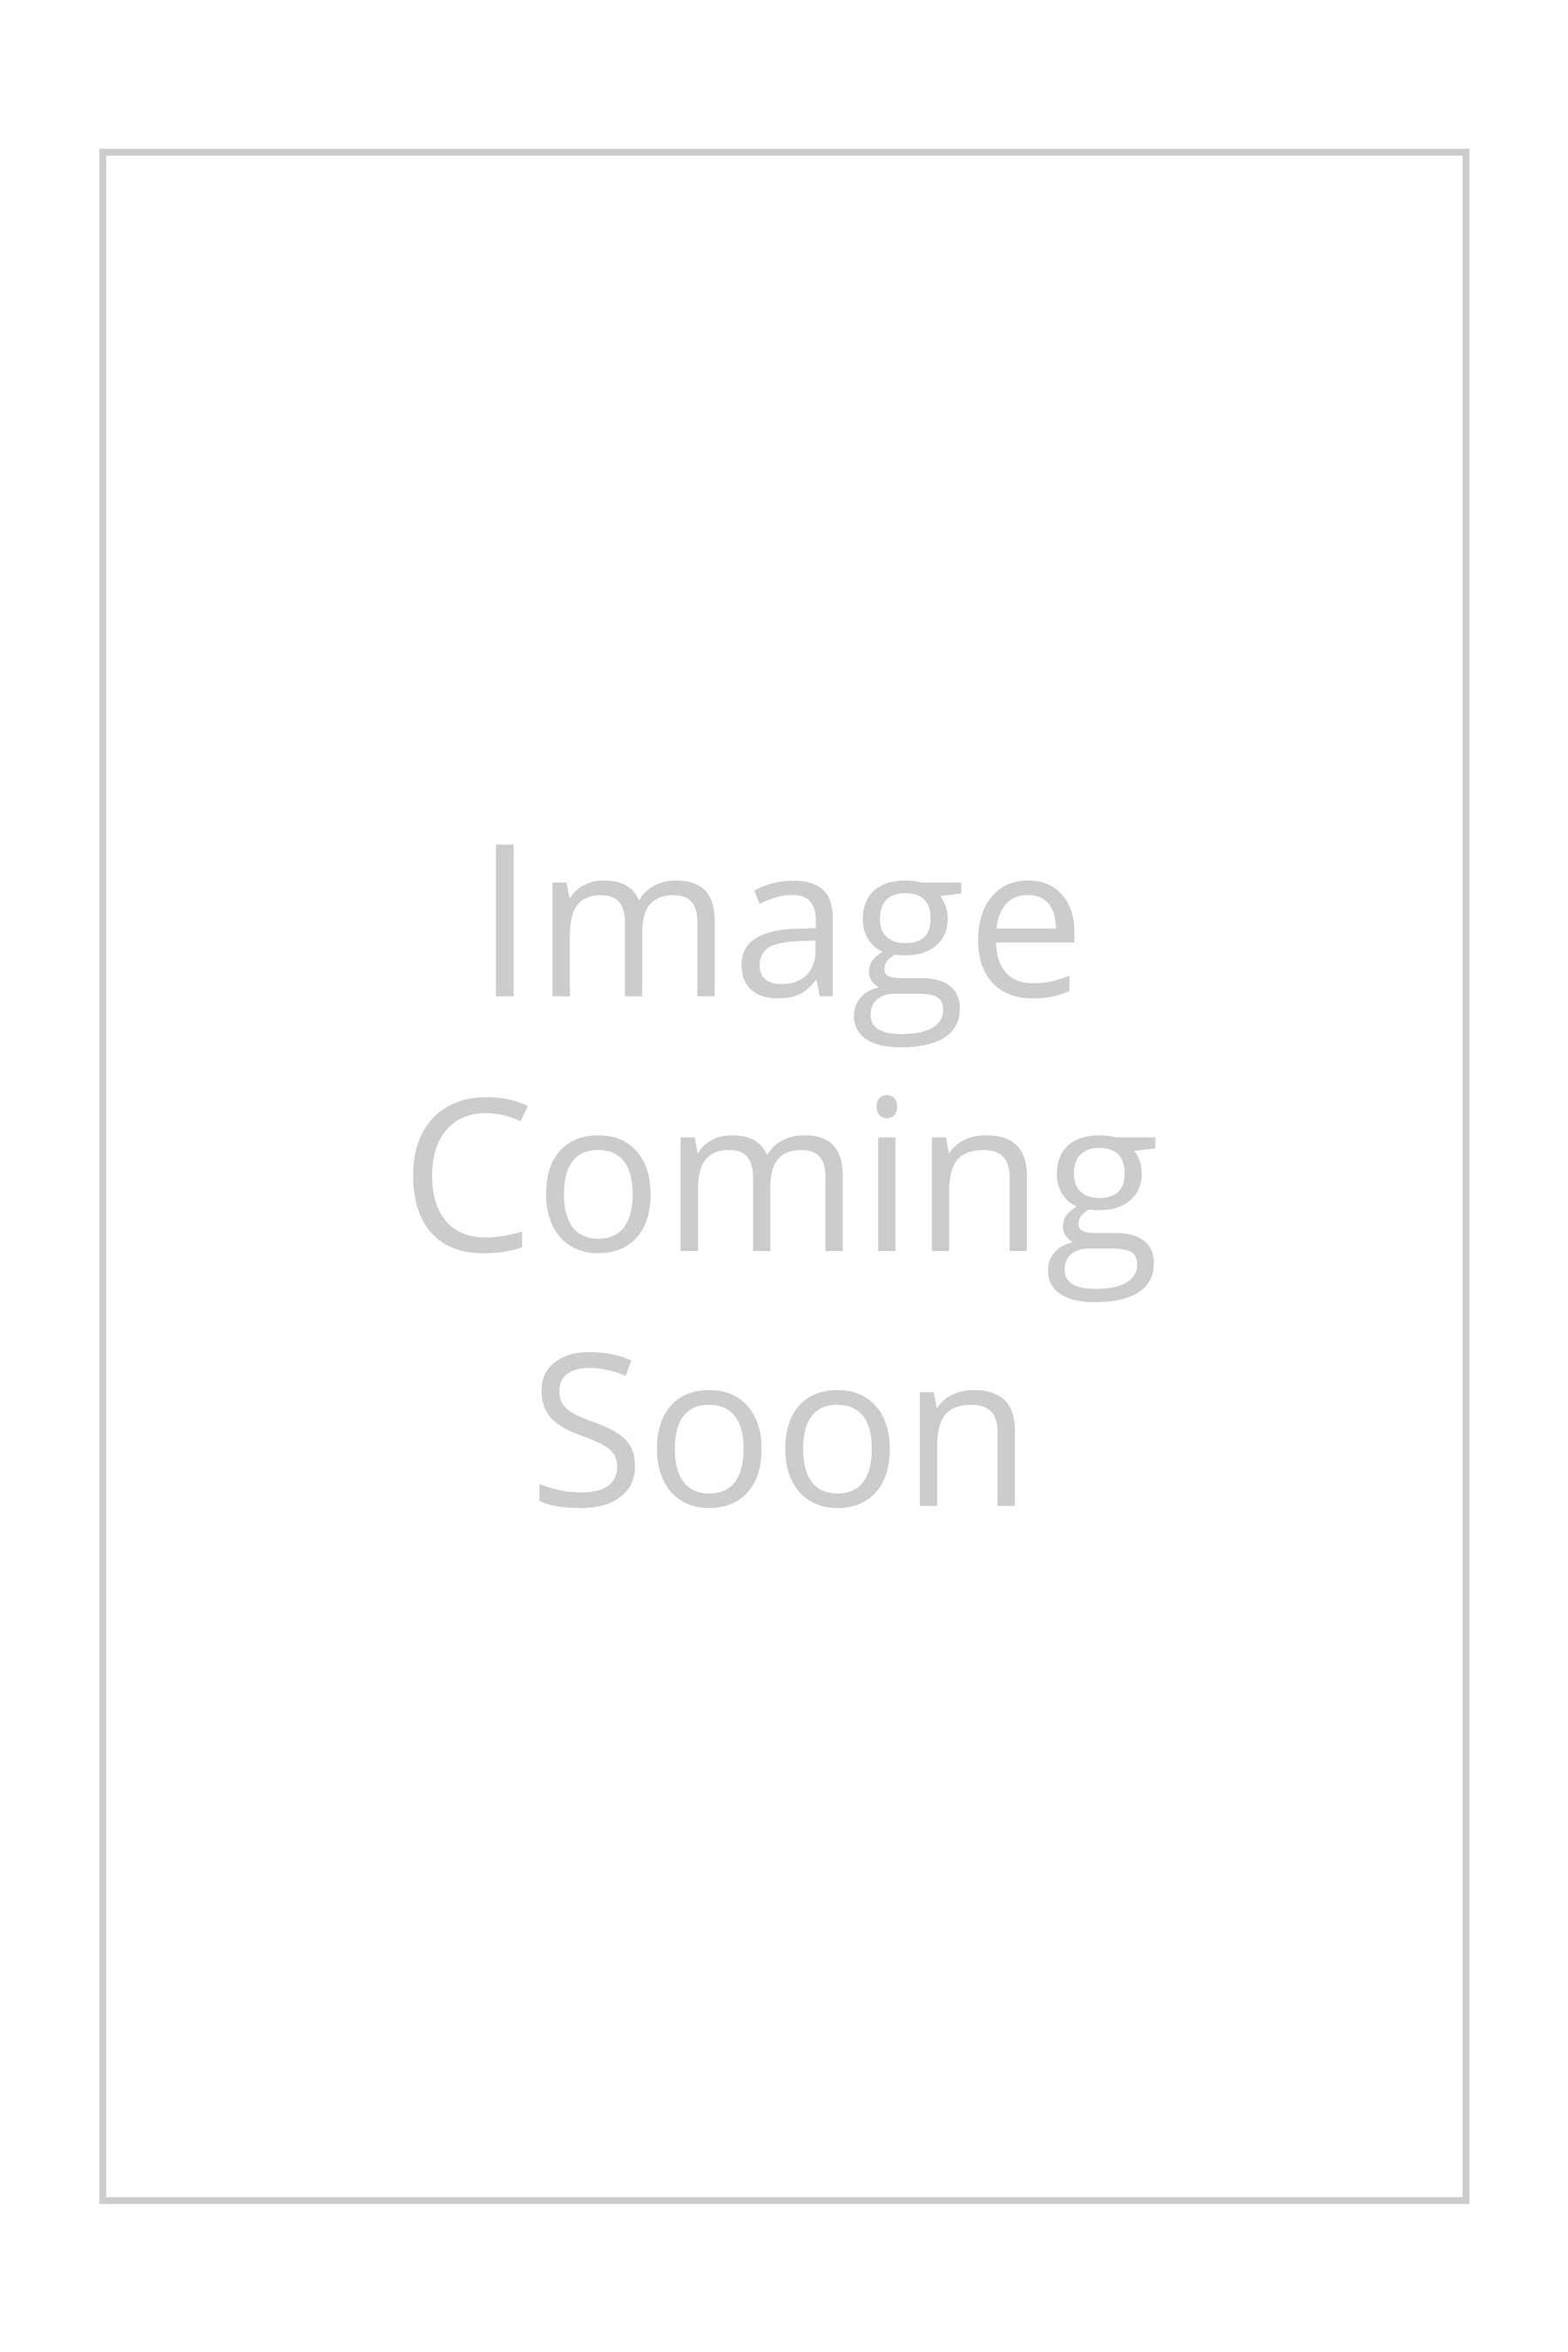 Ralph Lauren Black Label Navy Blue Viscose Knit Sheath Dress